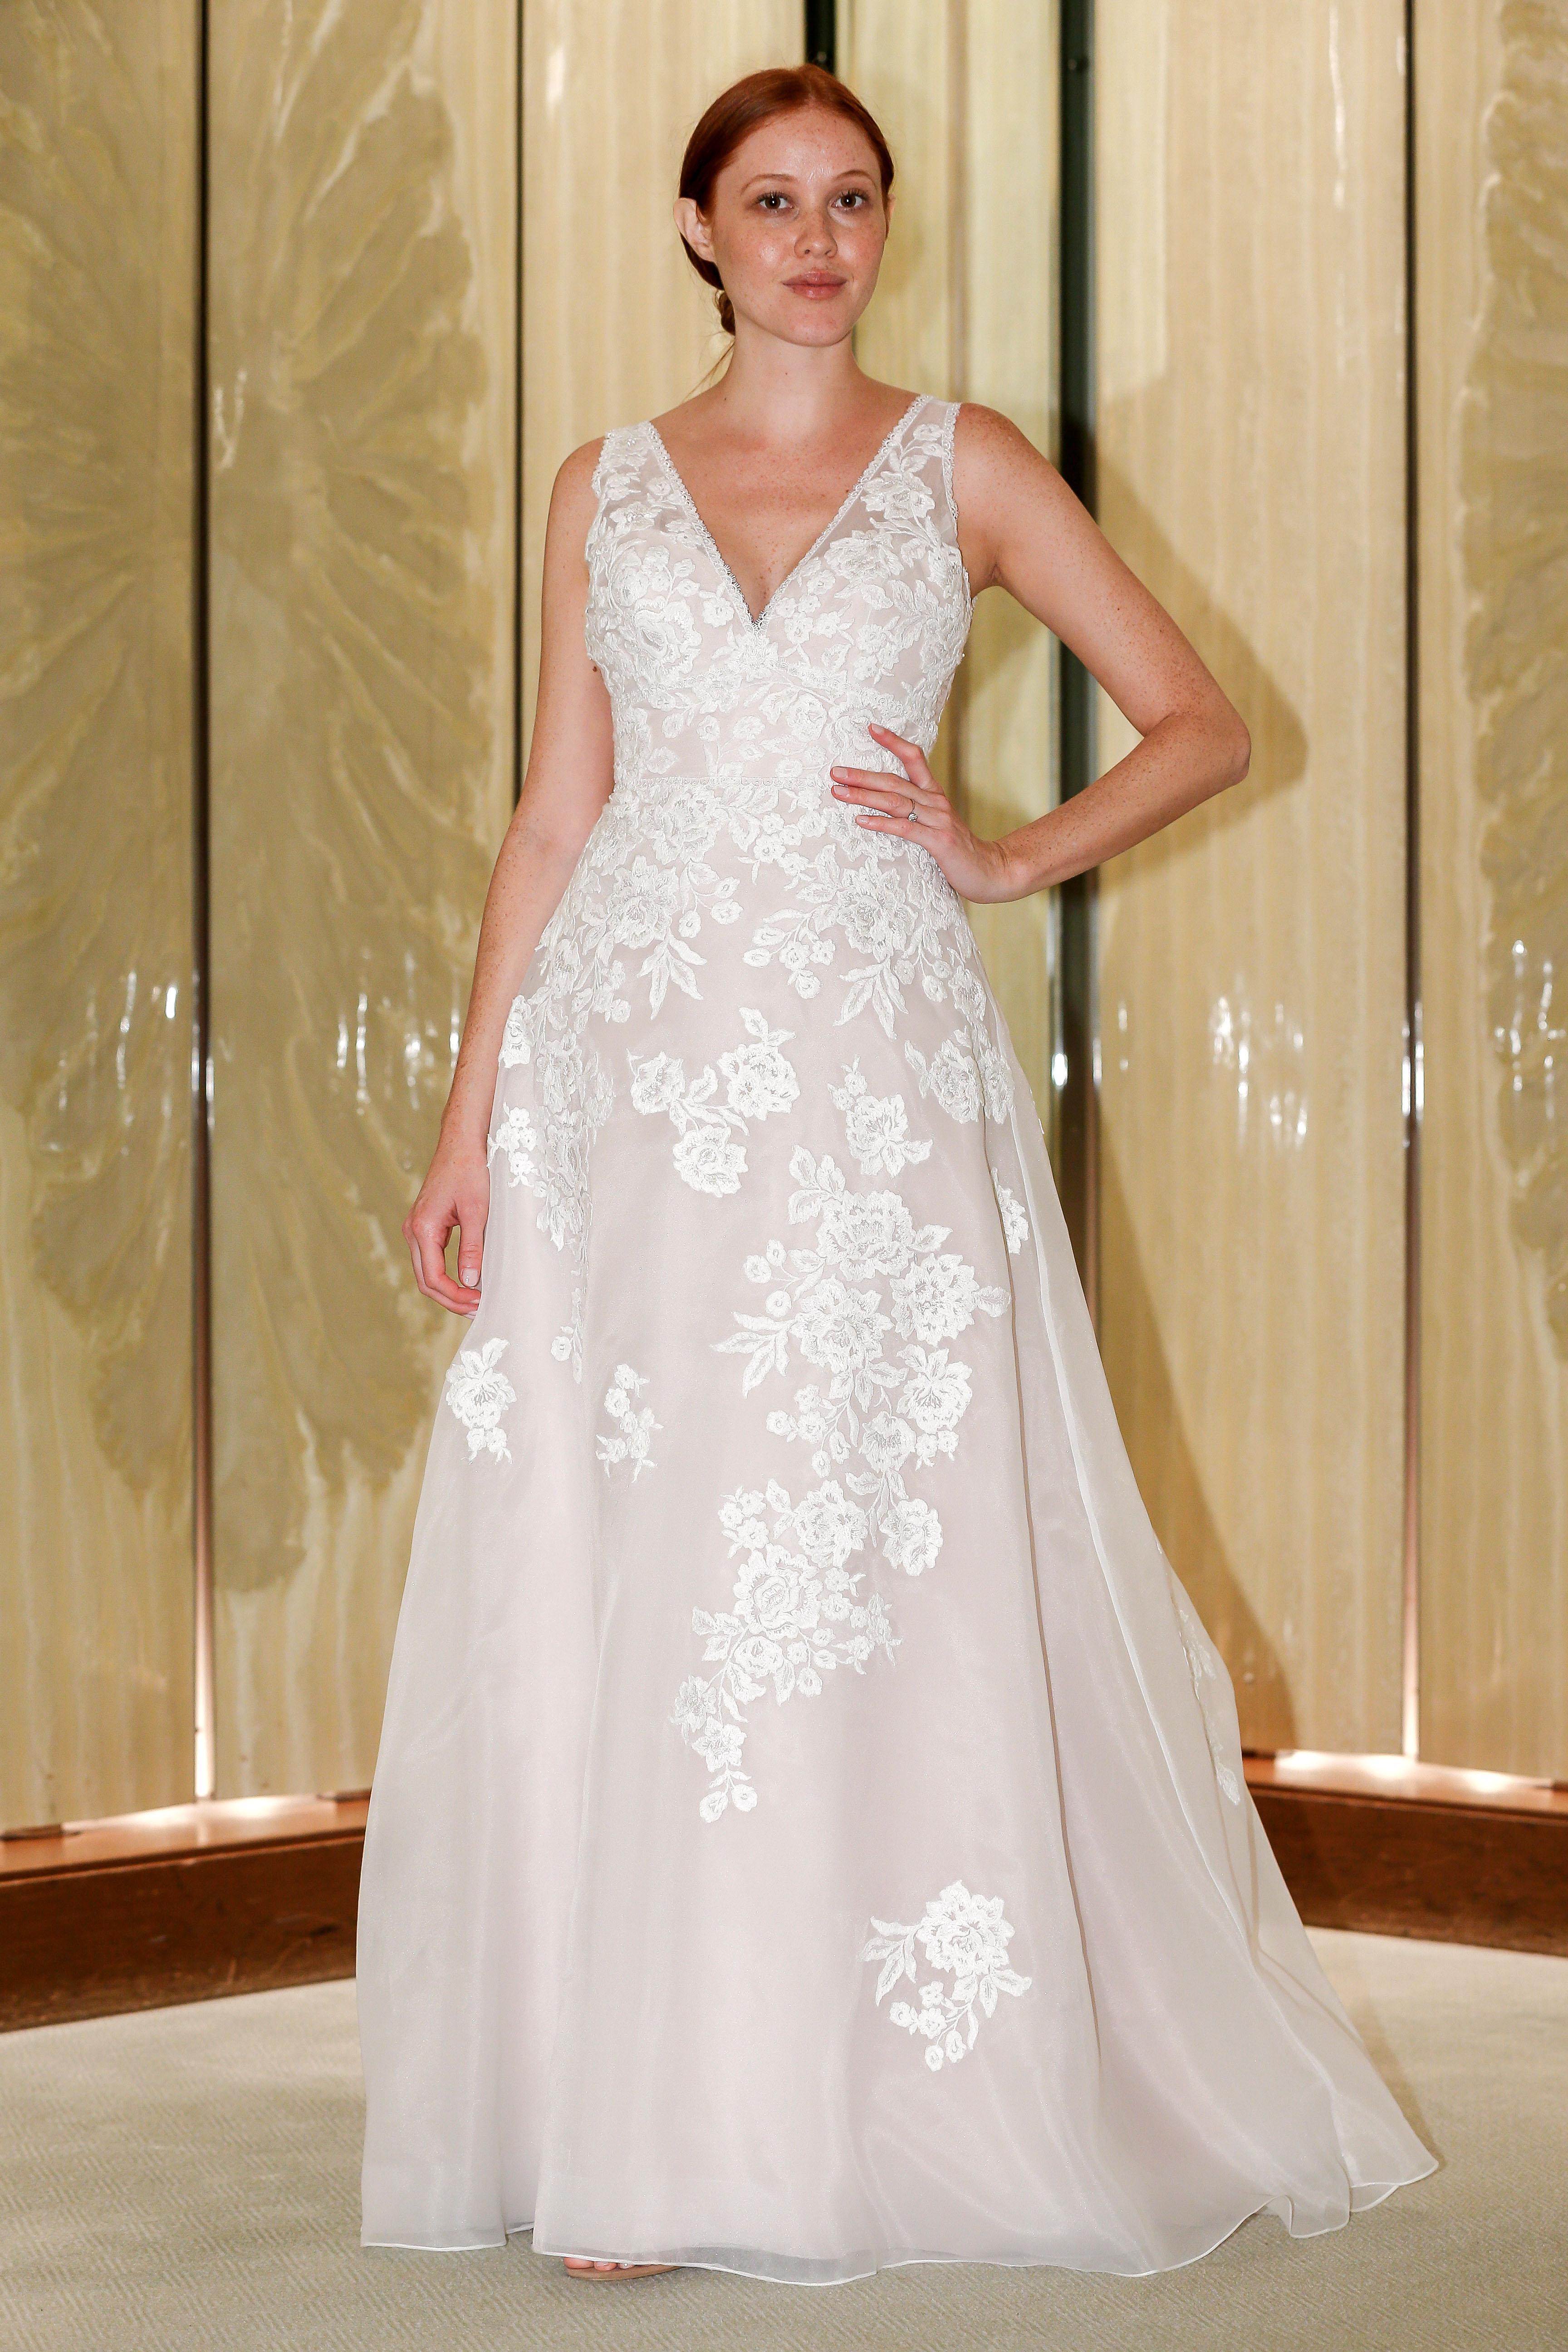 randy fenoli wedding dress floral lace v-neck a-line